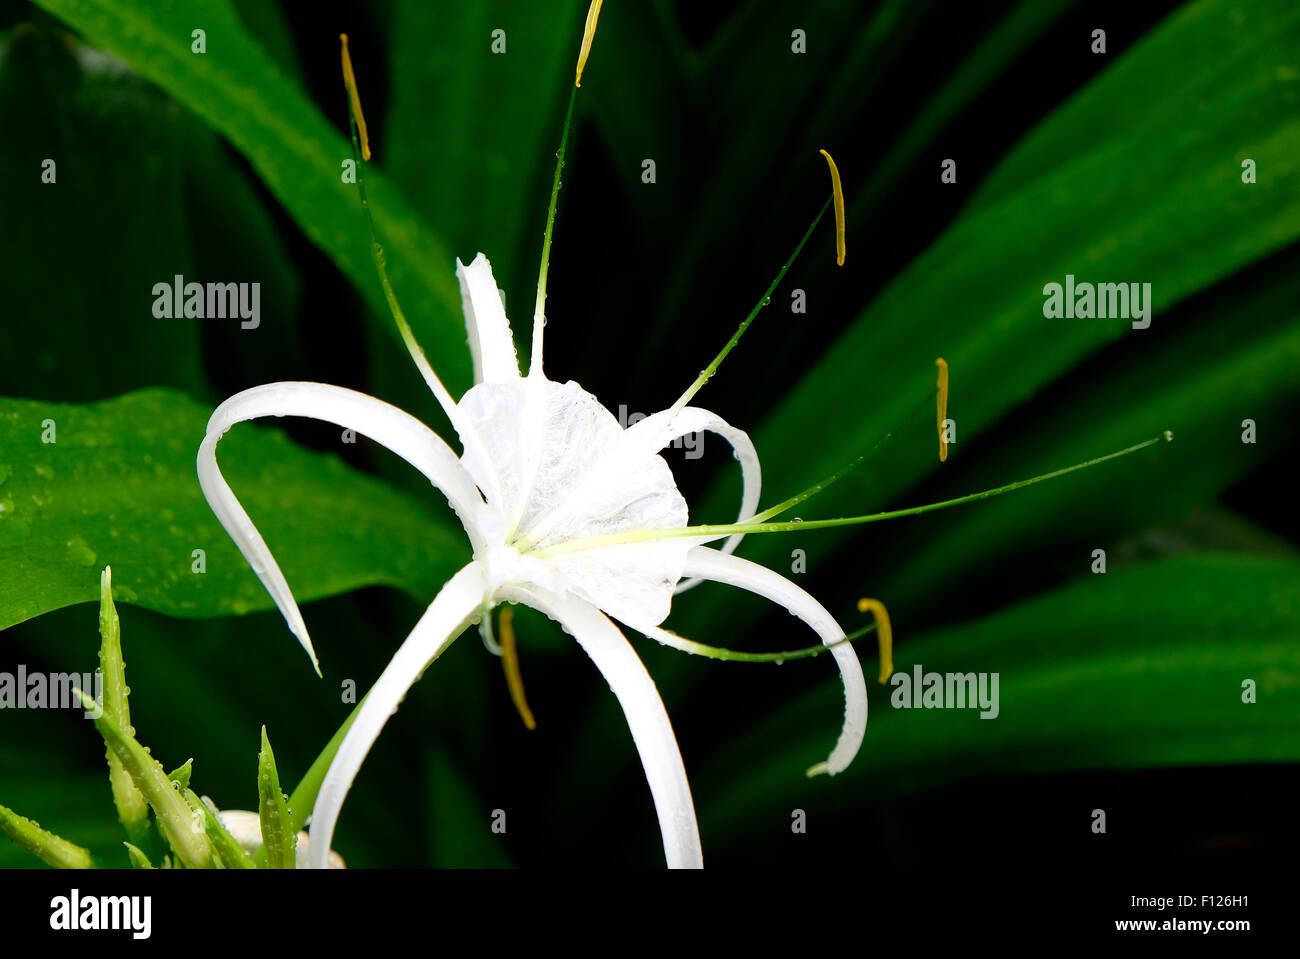 White spider lily flower growing in garden stock photo 86715581 alamy white spider lily flower growing in garden izmirmasajfo Image collections